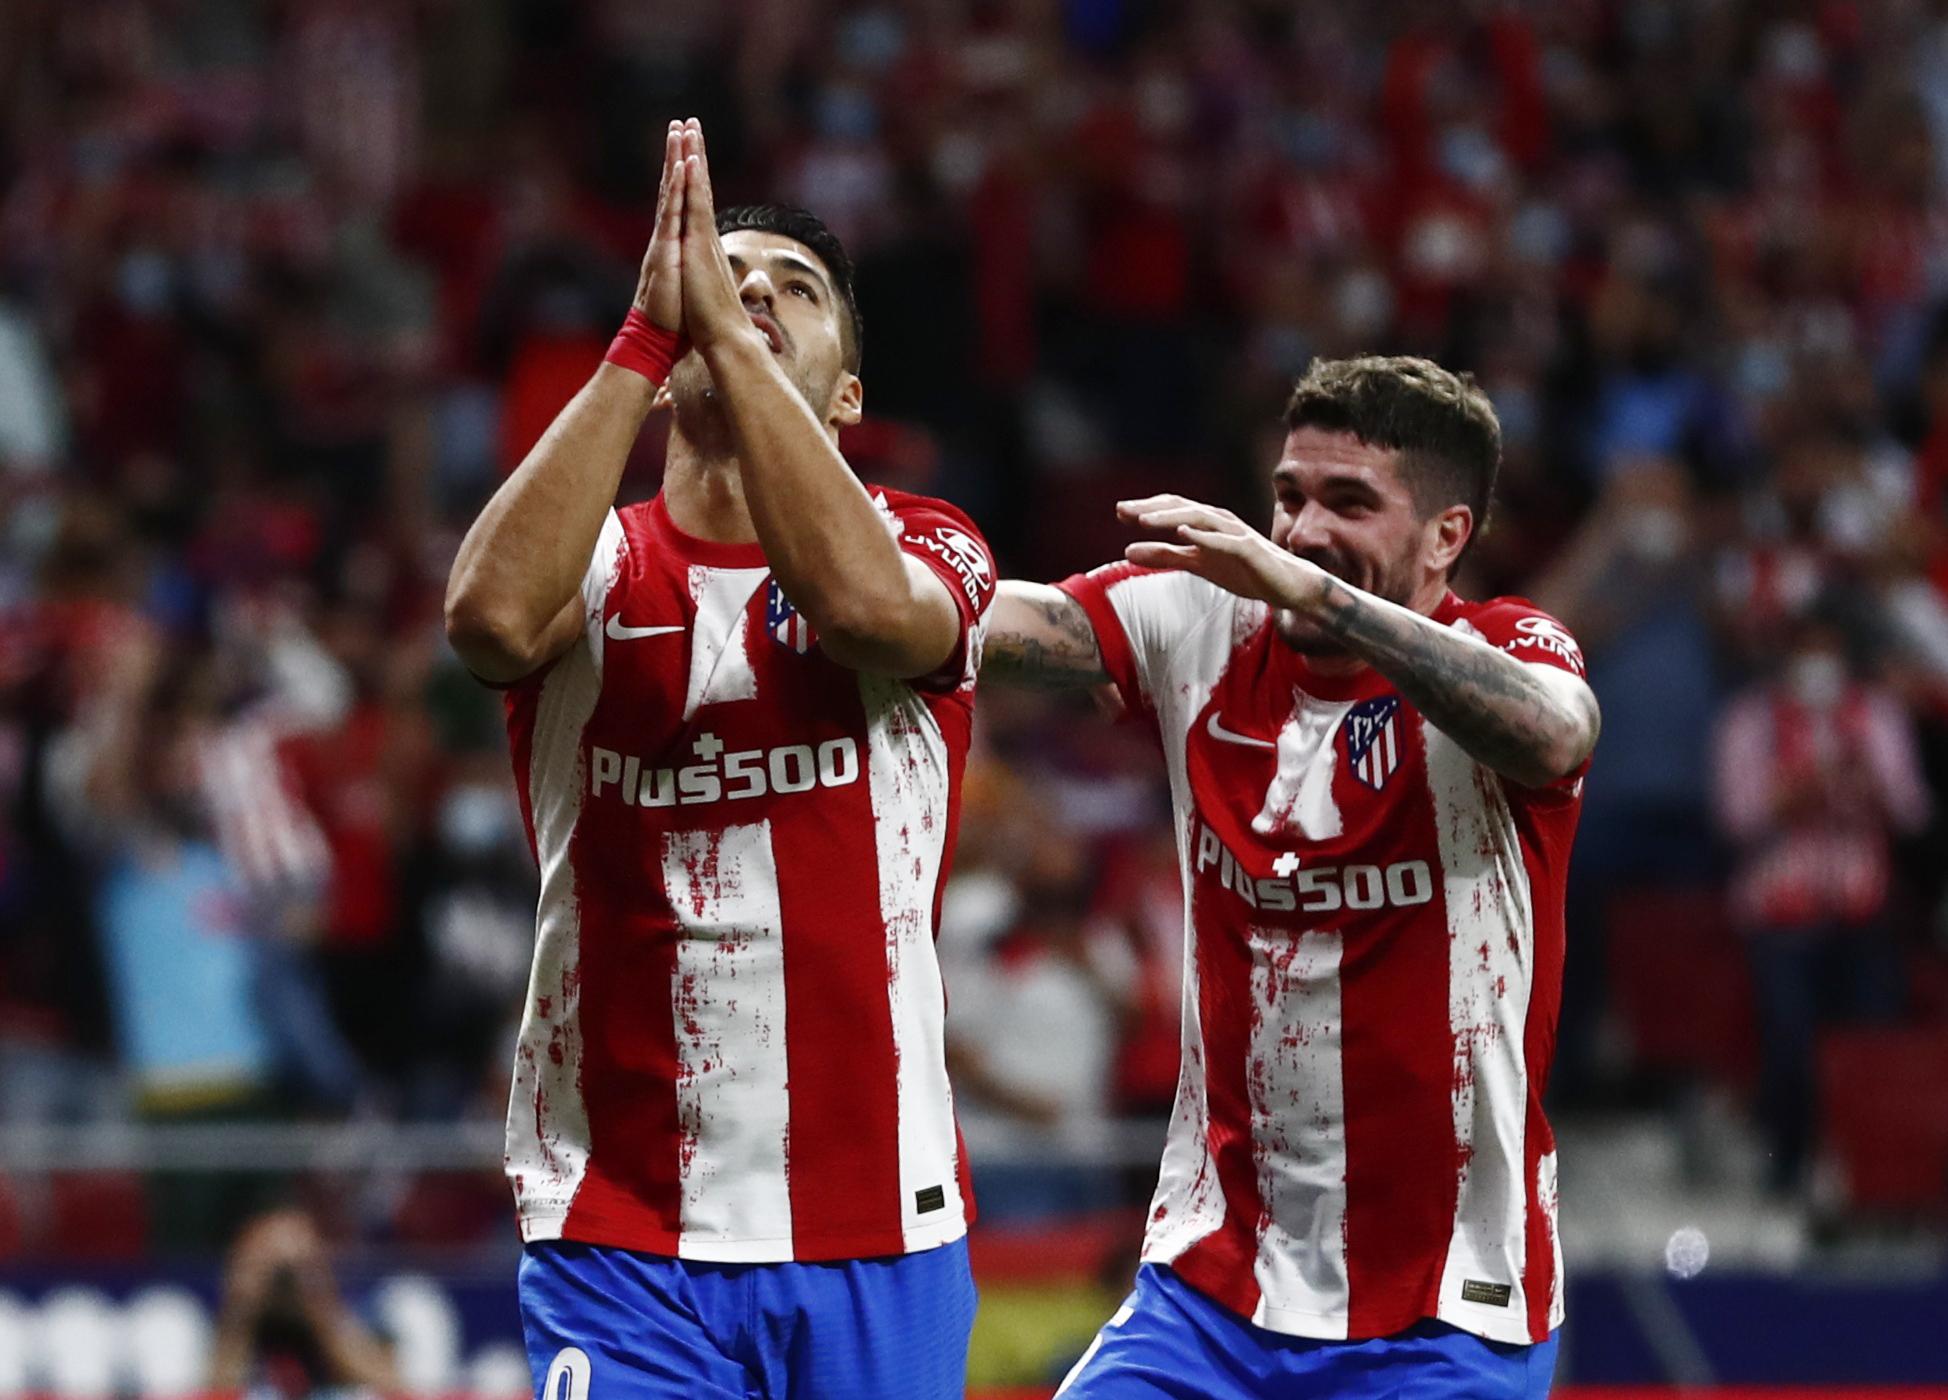 La Liga, Ατλέτικο Μαδρίτης – Μπαρτσελόνα: Ο Σουάρες σκόραρε κατά της παλιάς του ομάδας